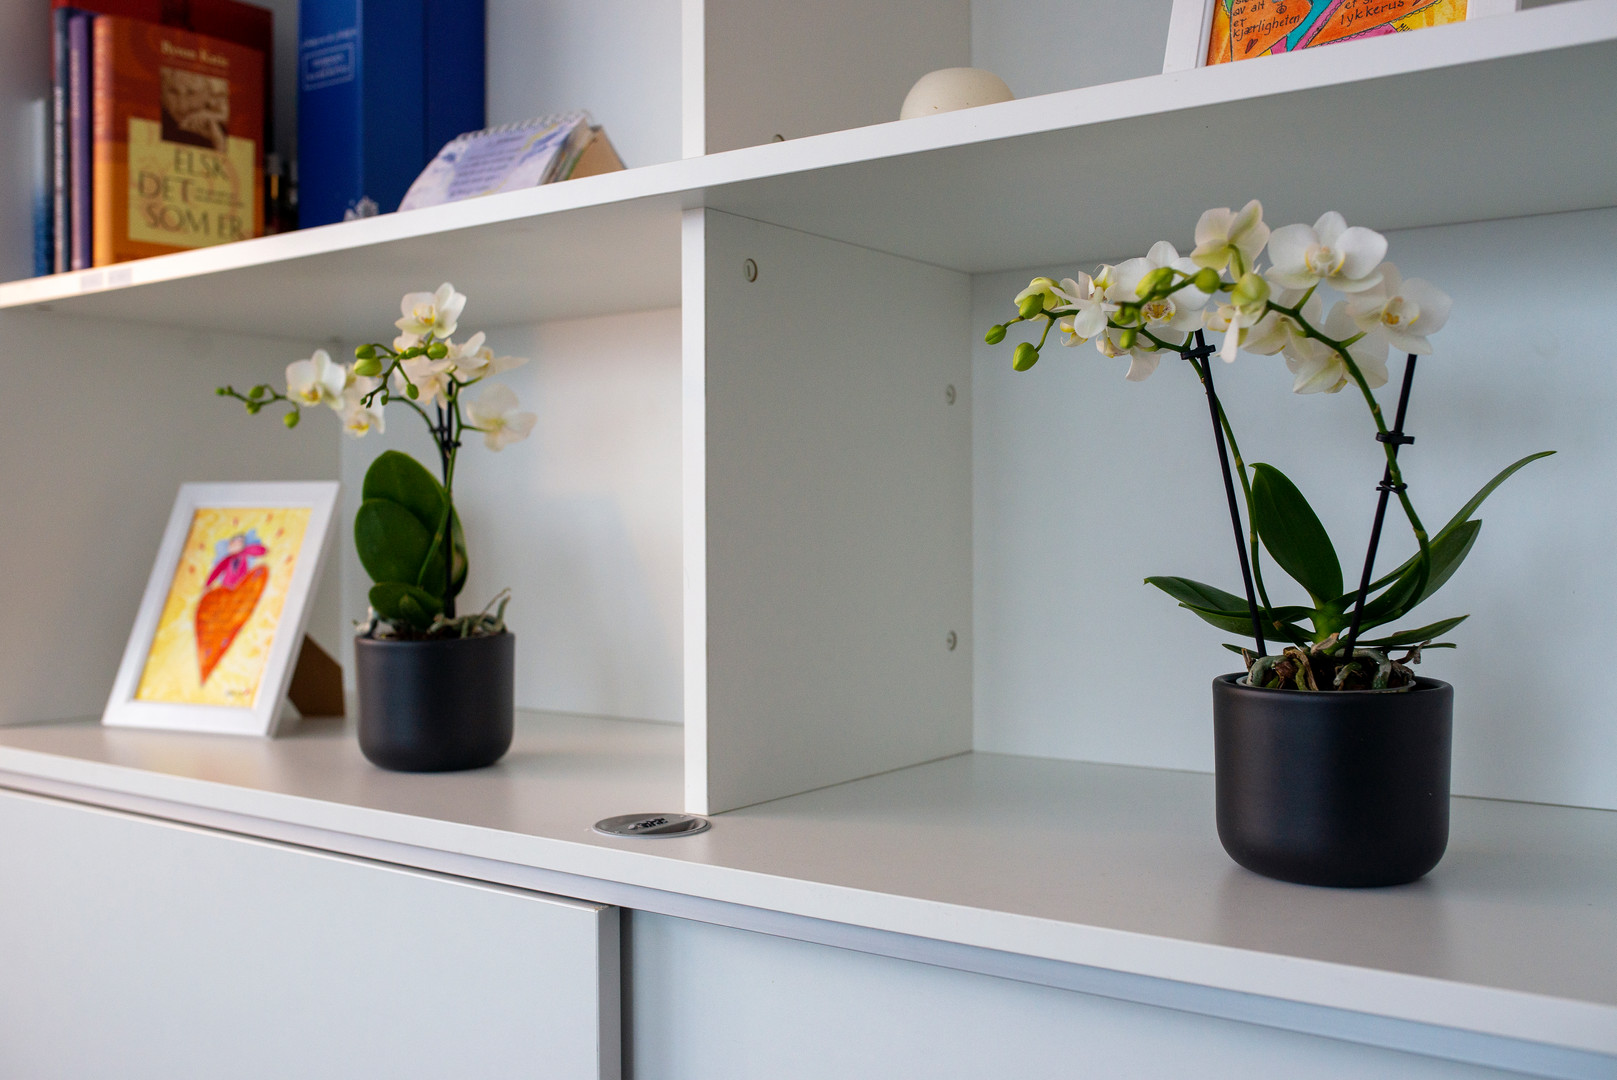 Detaljbilde orkideer i reol.jpg